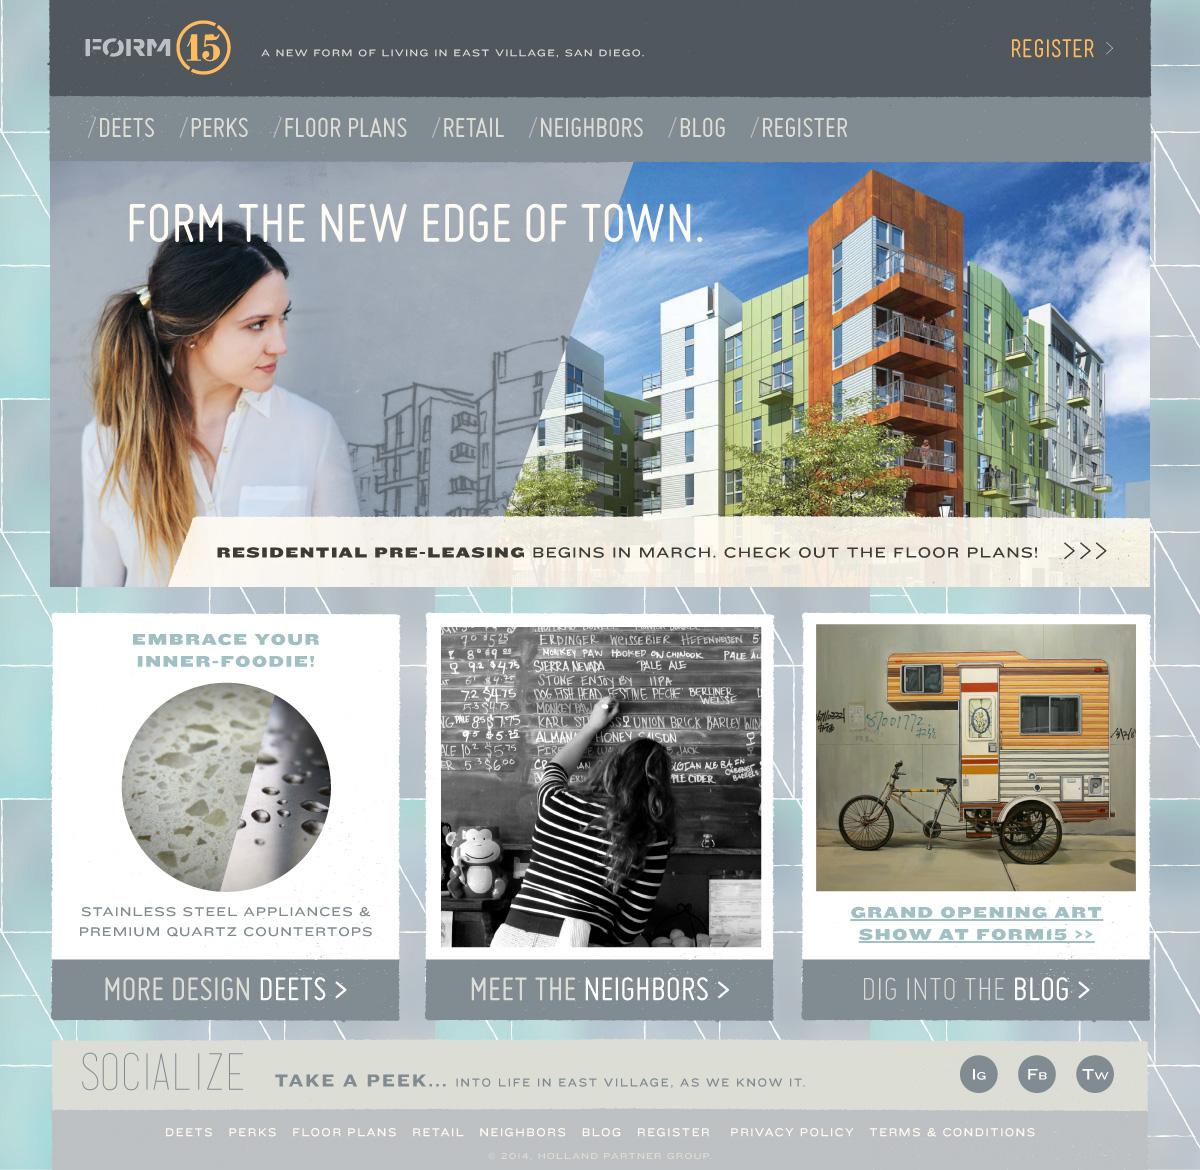 miriello-grafico_FORM15-San-Diego-East-Village-Downtown-apartment-branding-33.jpg